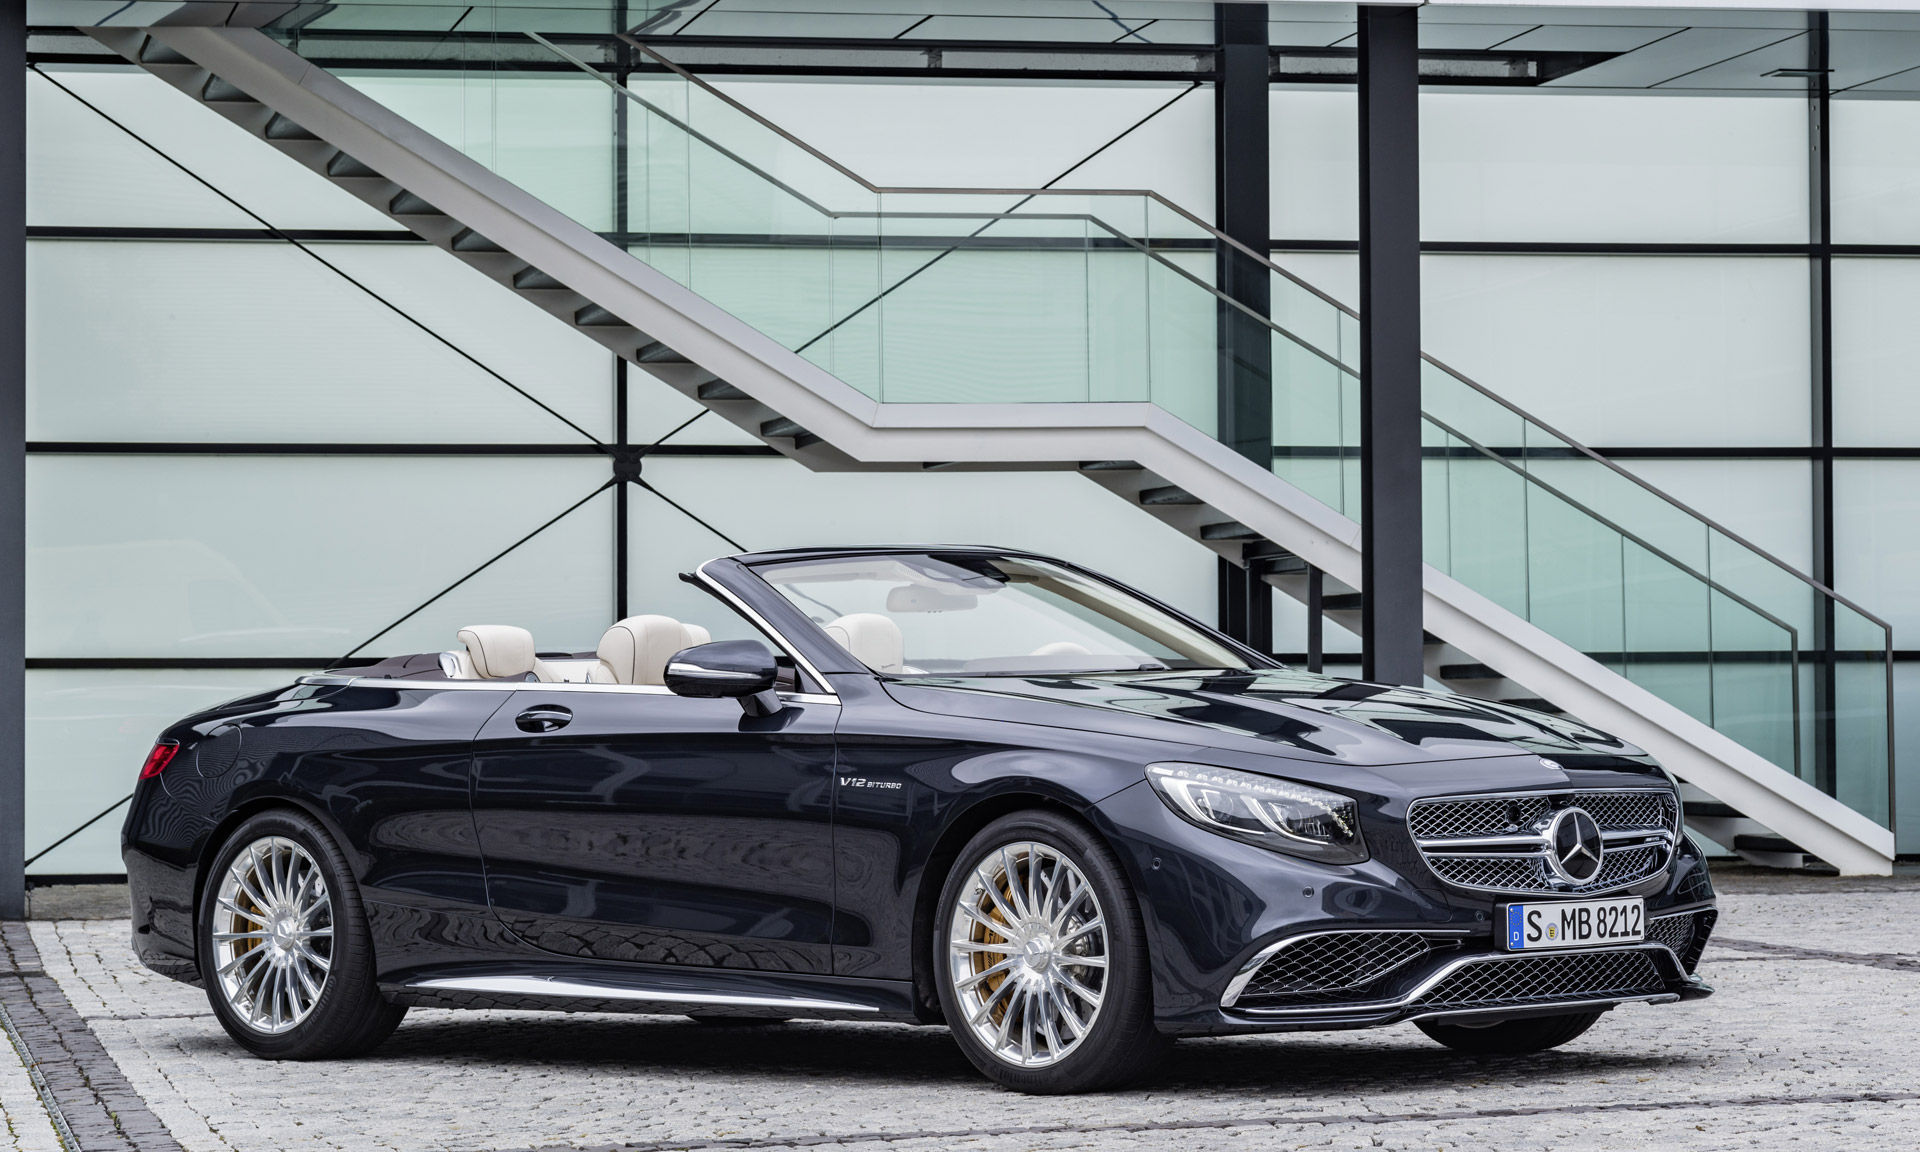 2017 Mercedes-Benz S-Class | 2017 Mercedes-AMG S65 Cabriolet